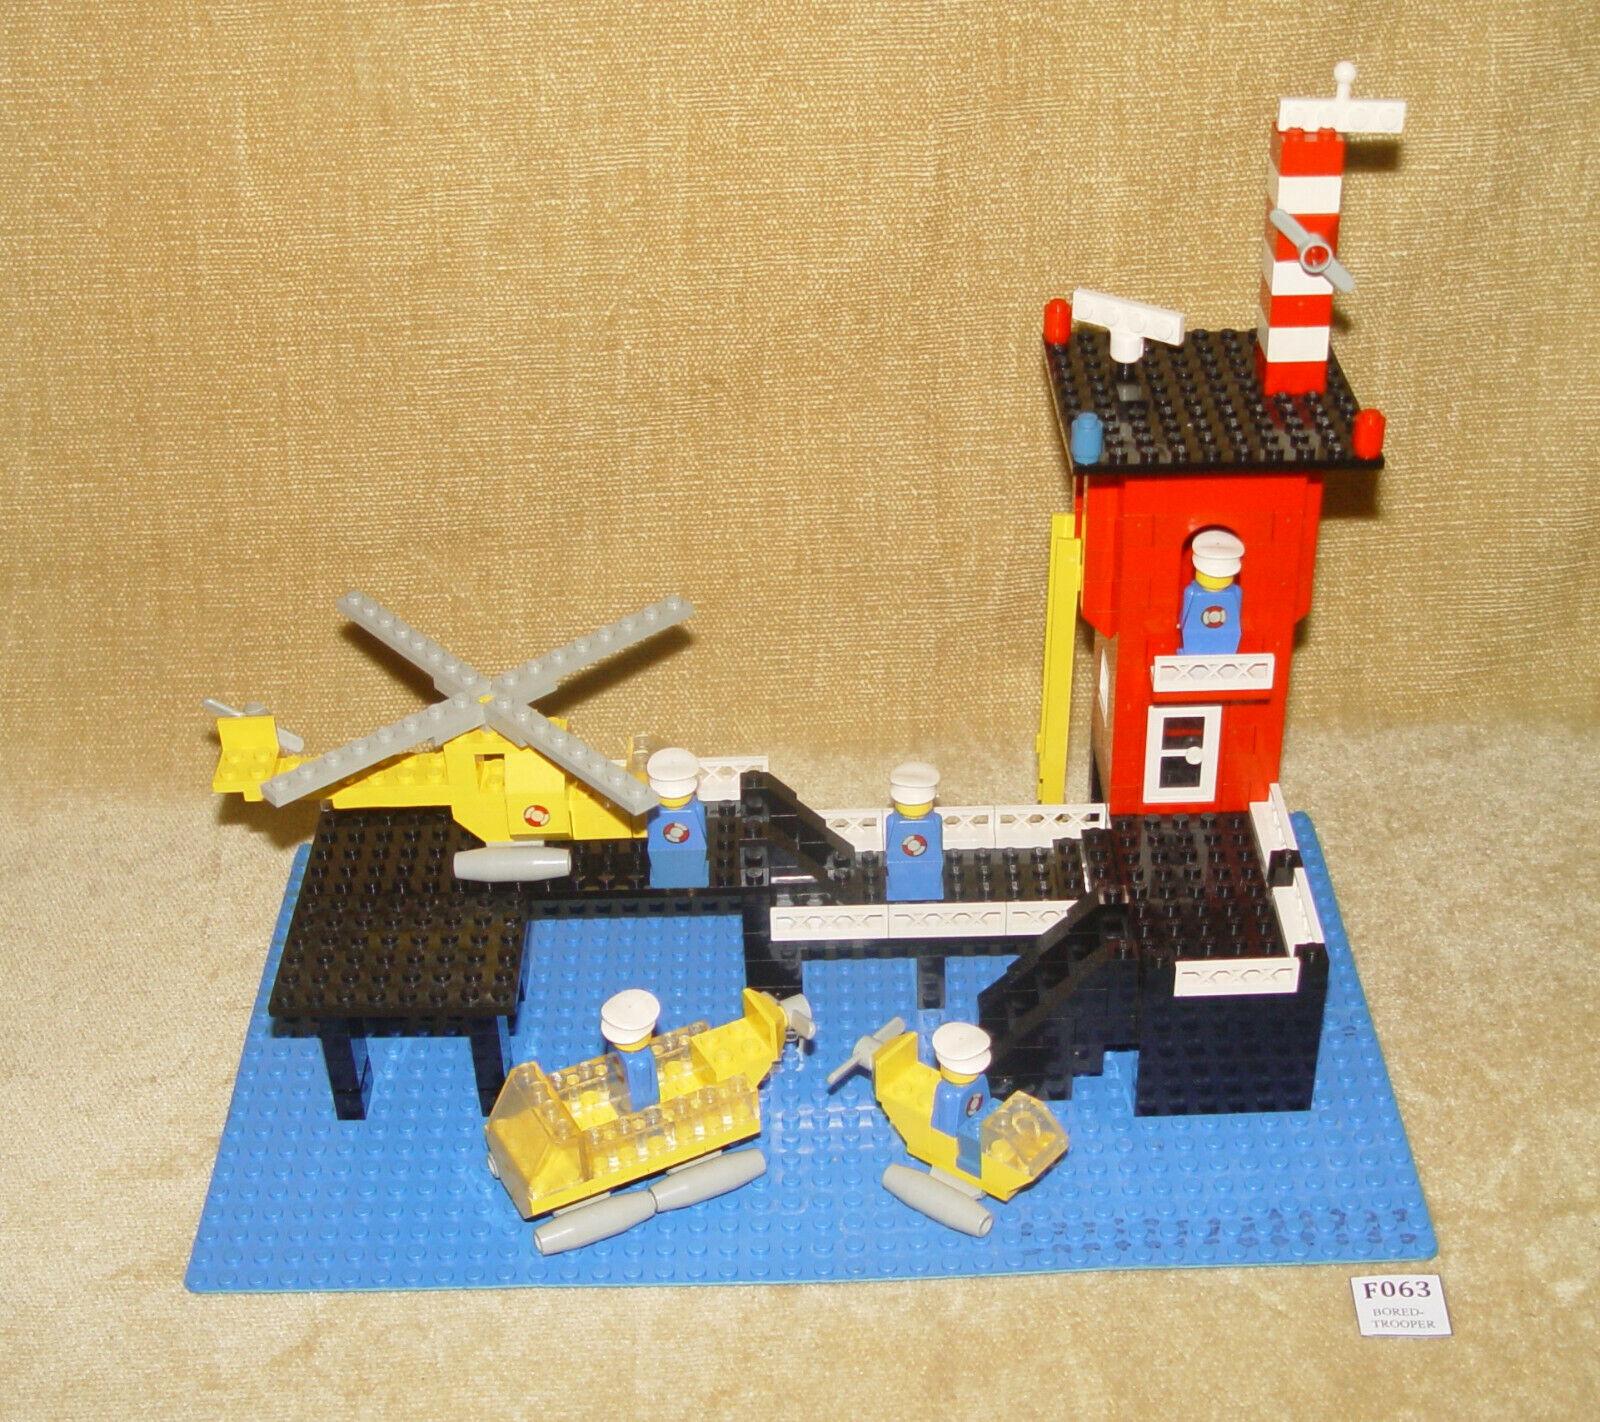 LEGO Sets  Legoland  369-1 Coast Guard Station (1976) with MINIFIGURES Vintage